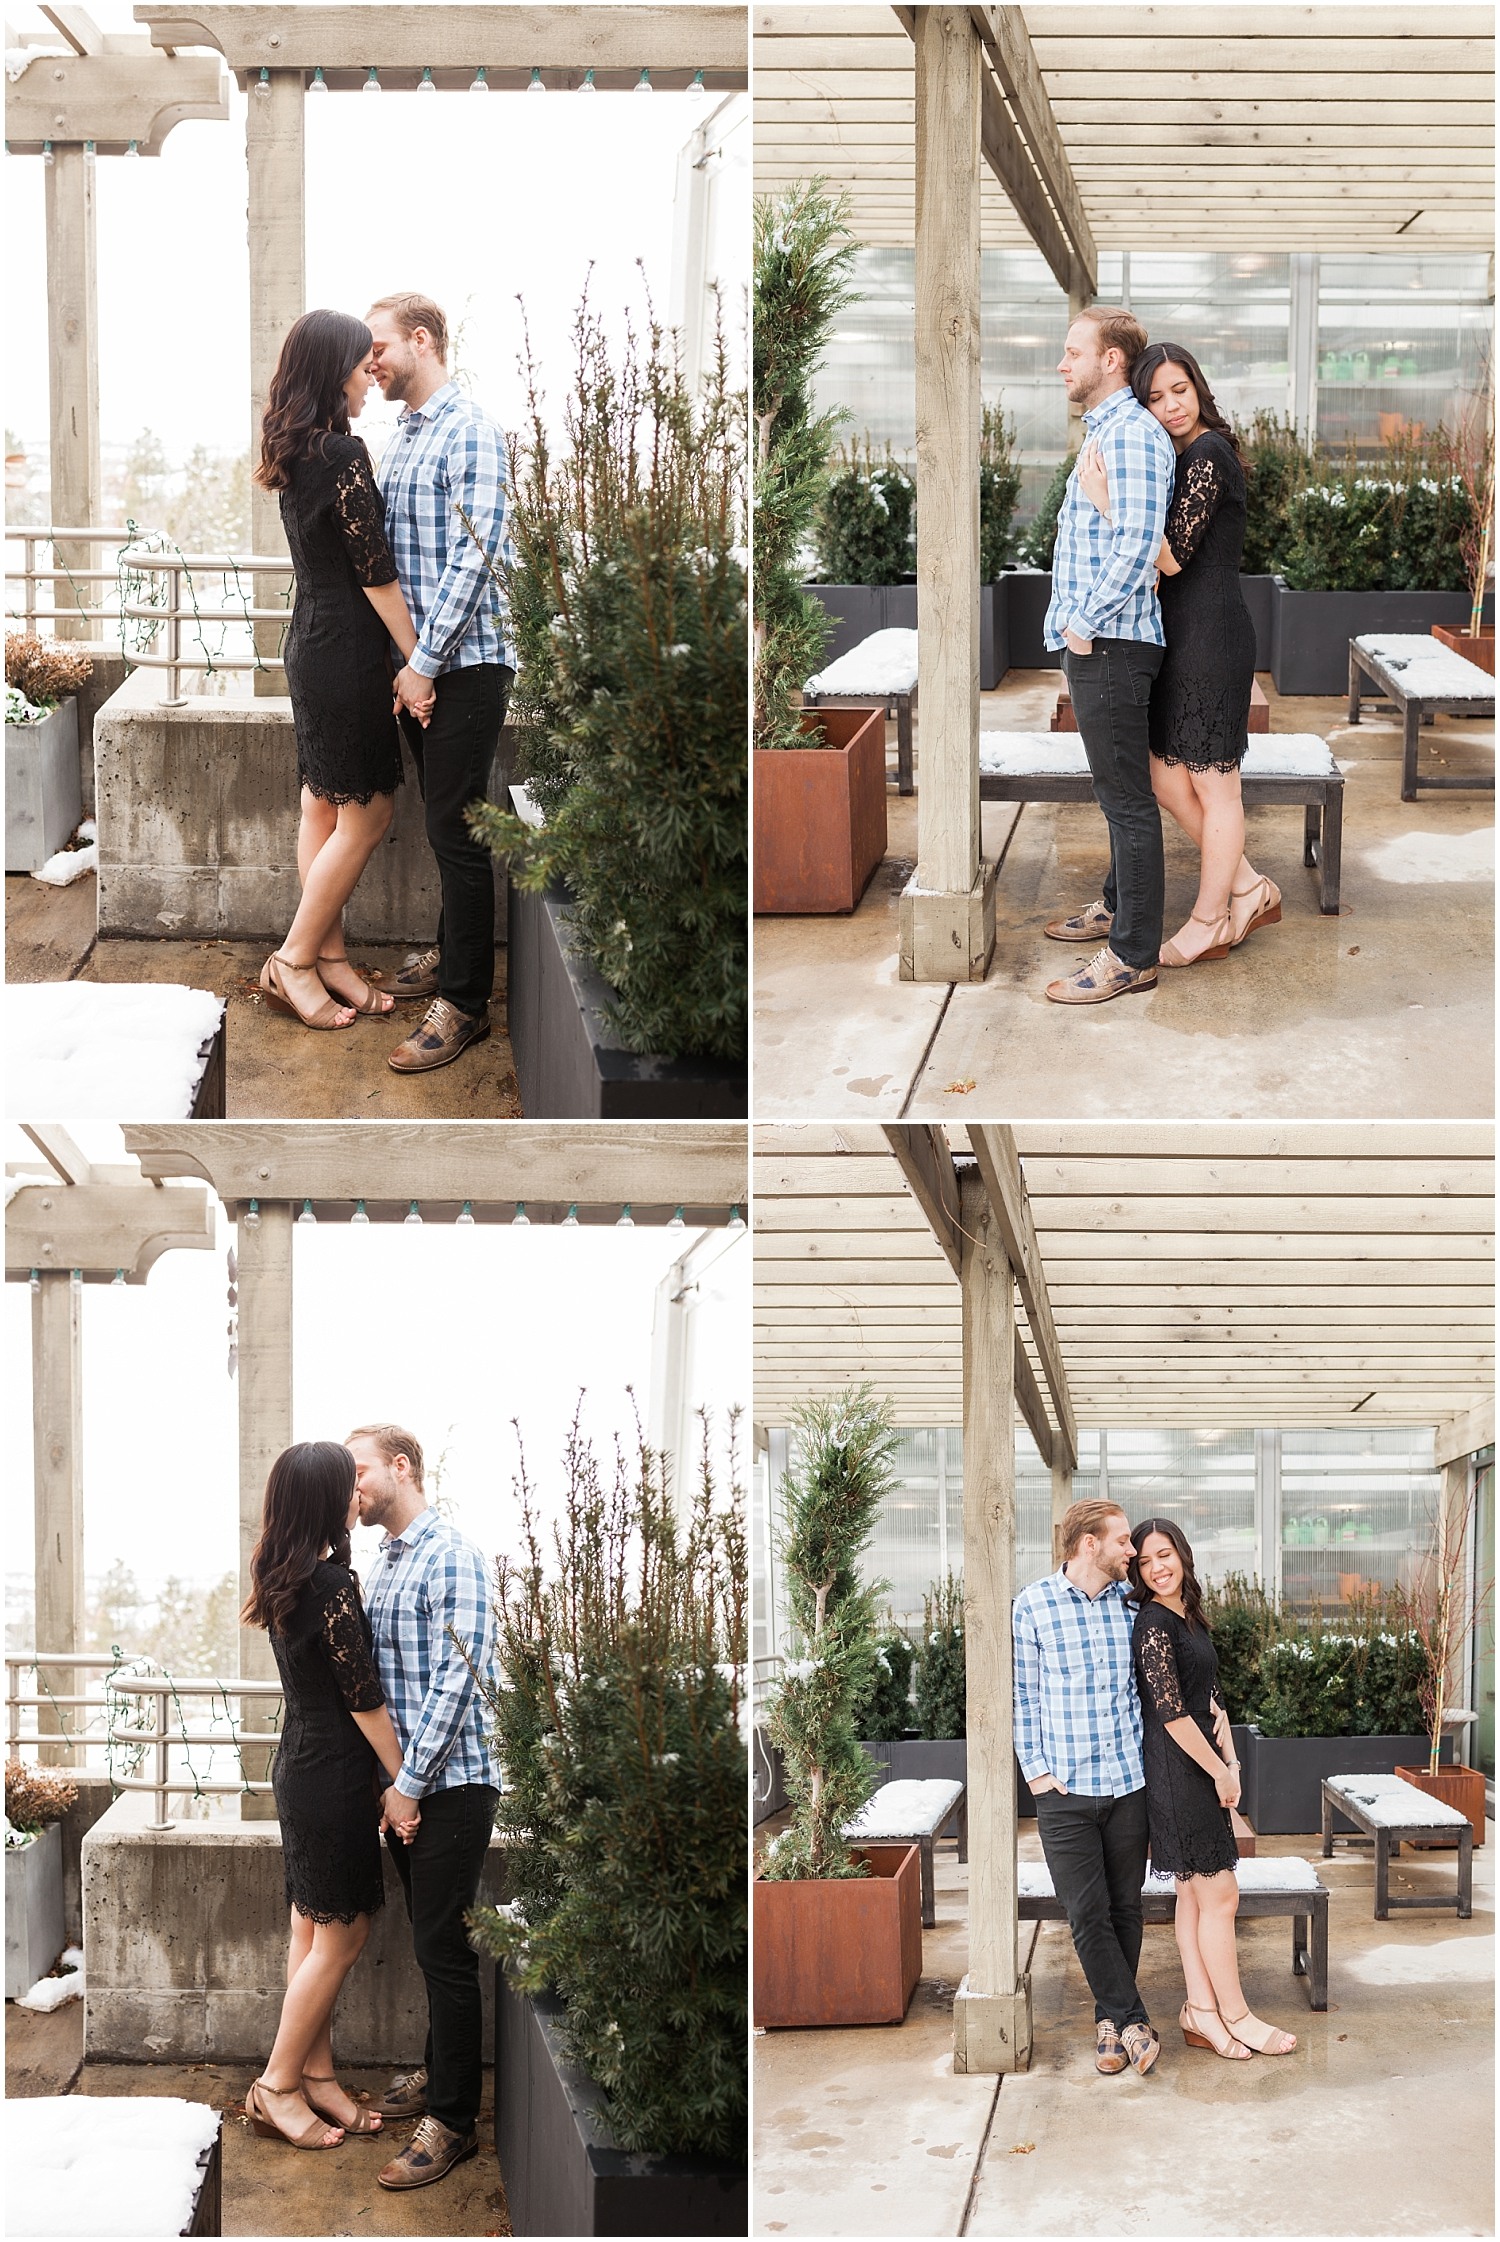 Greenhouse Engaements-Ryan & Rachael-Rachel Reyes Photography_0129.jpg